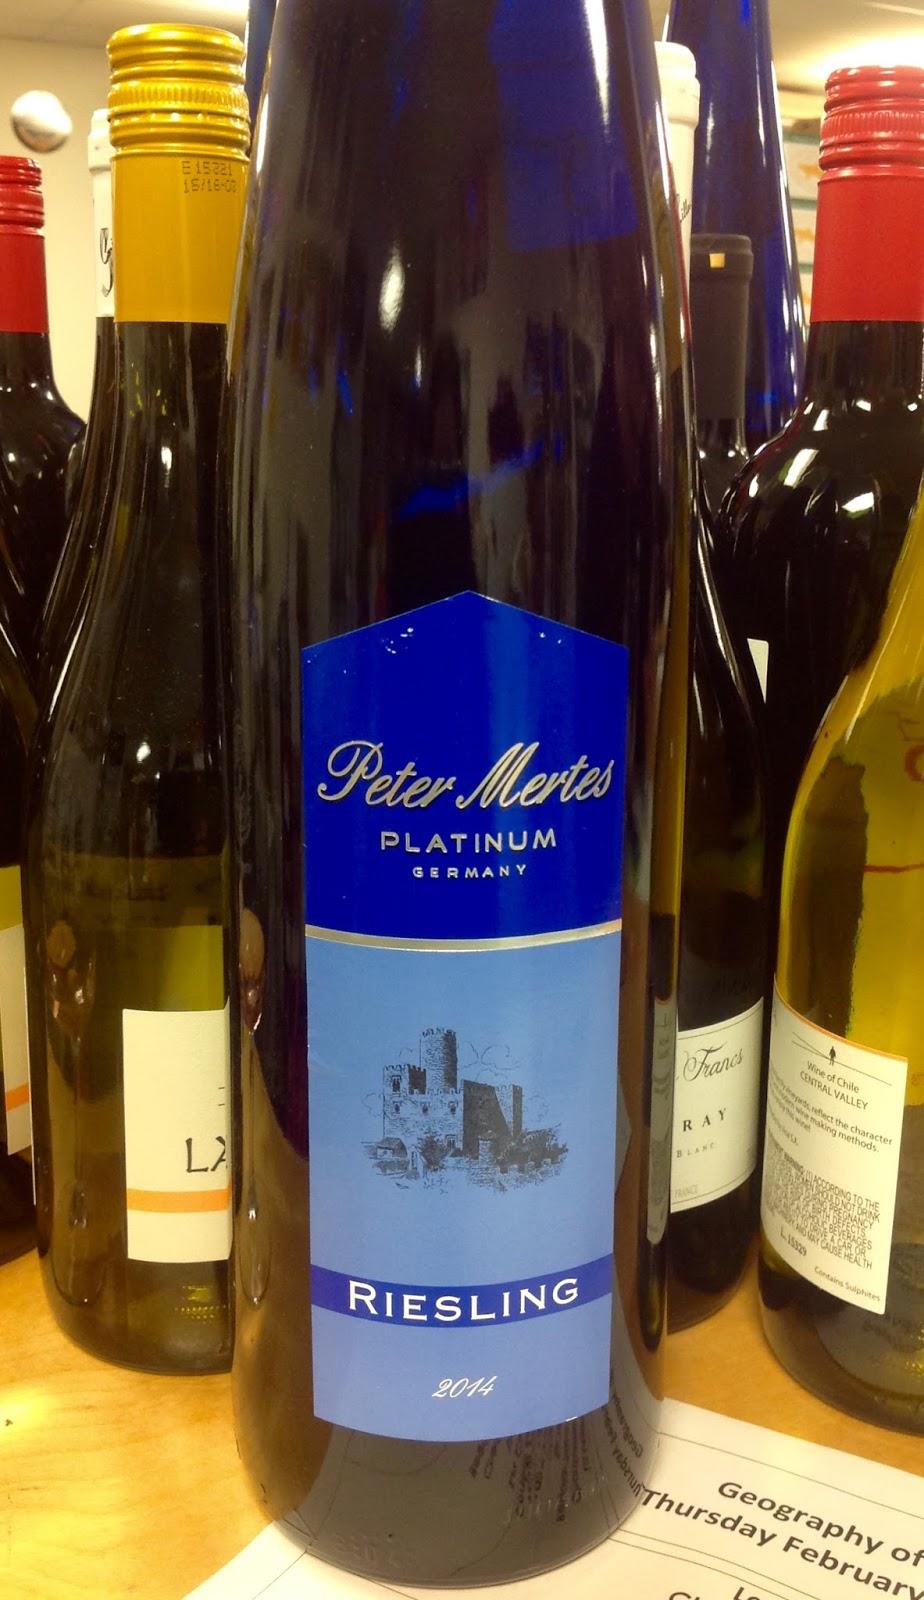 Tasting Peter Mertes Platinum Riesling Magnum